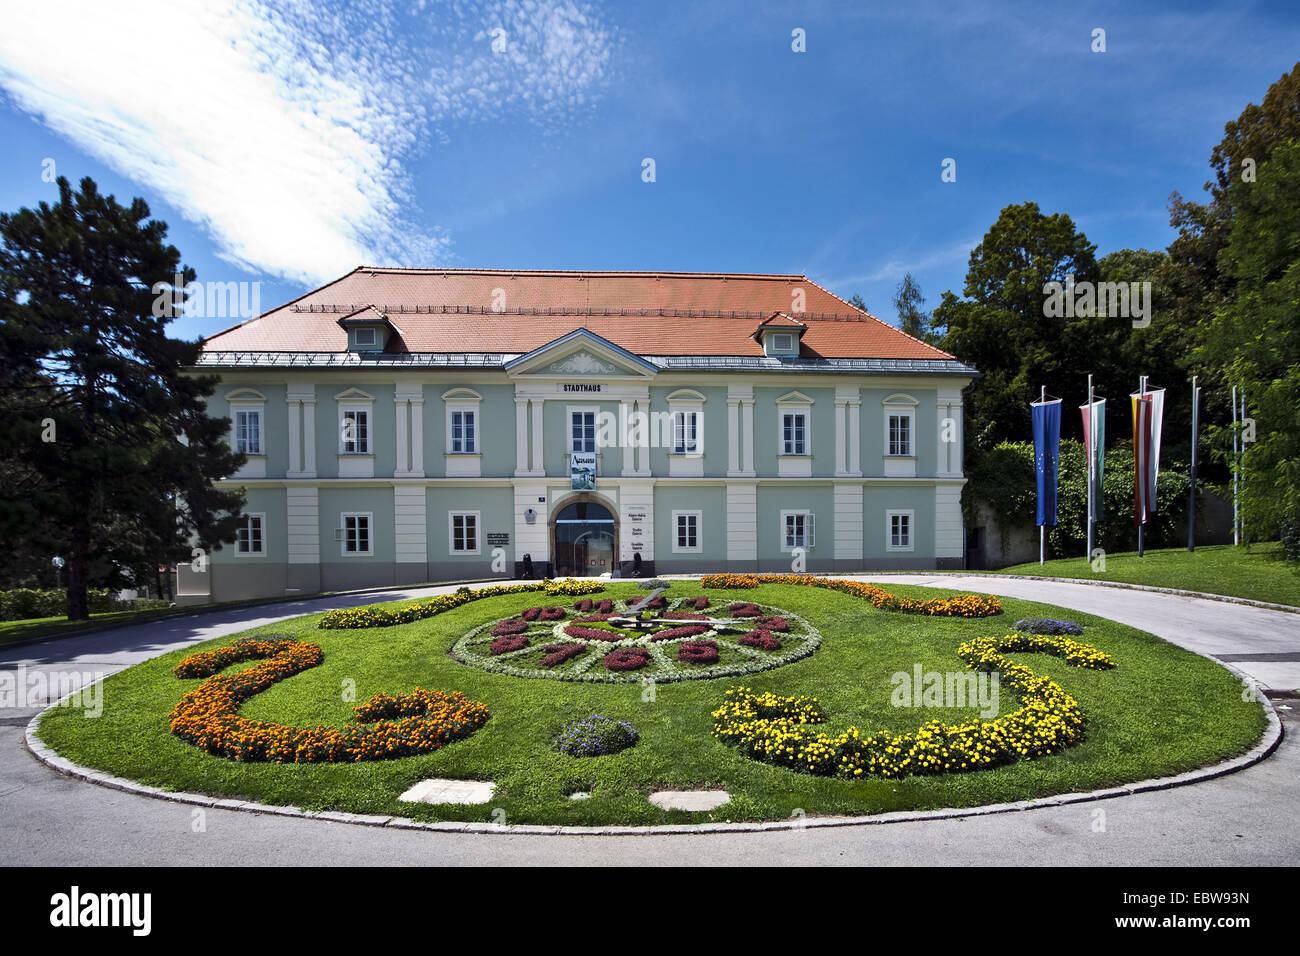 townhouse, Austria, Carinthia, Klagenfurt - Stock Image